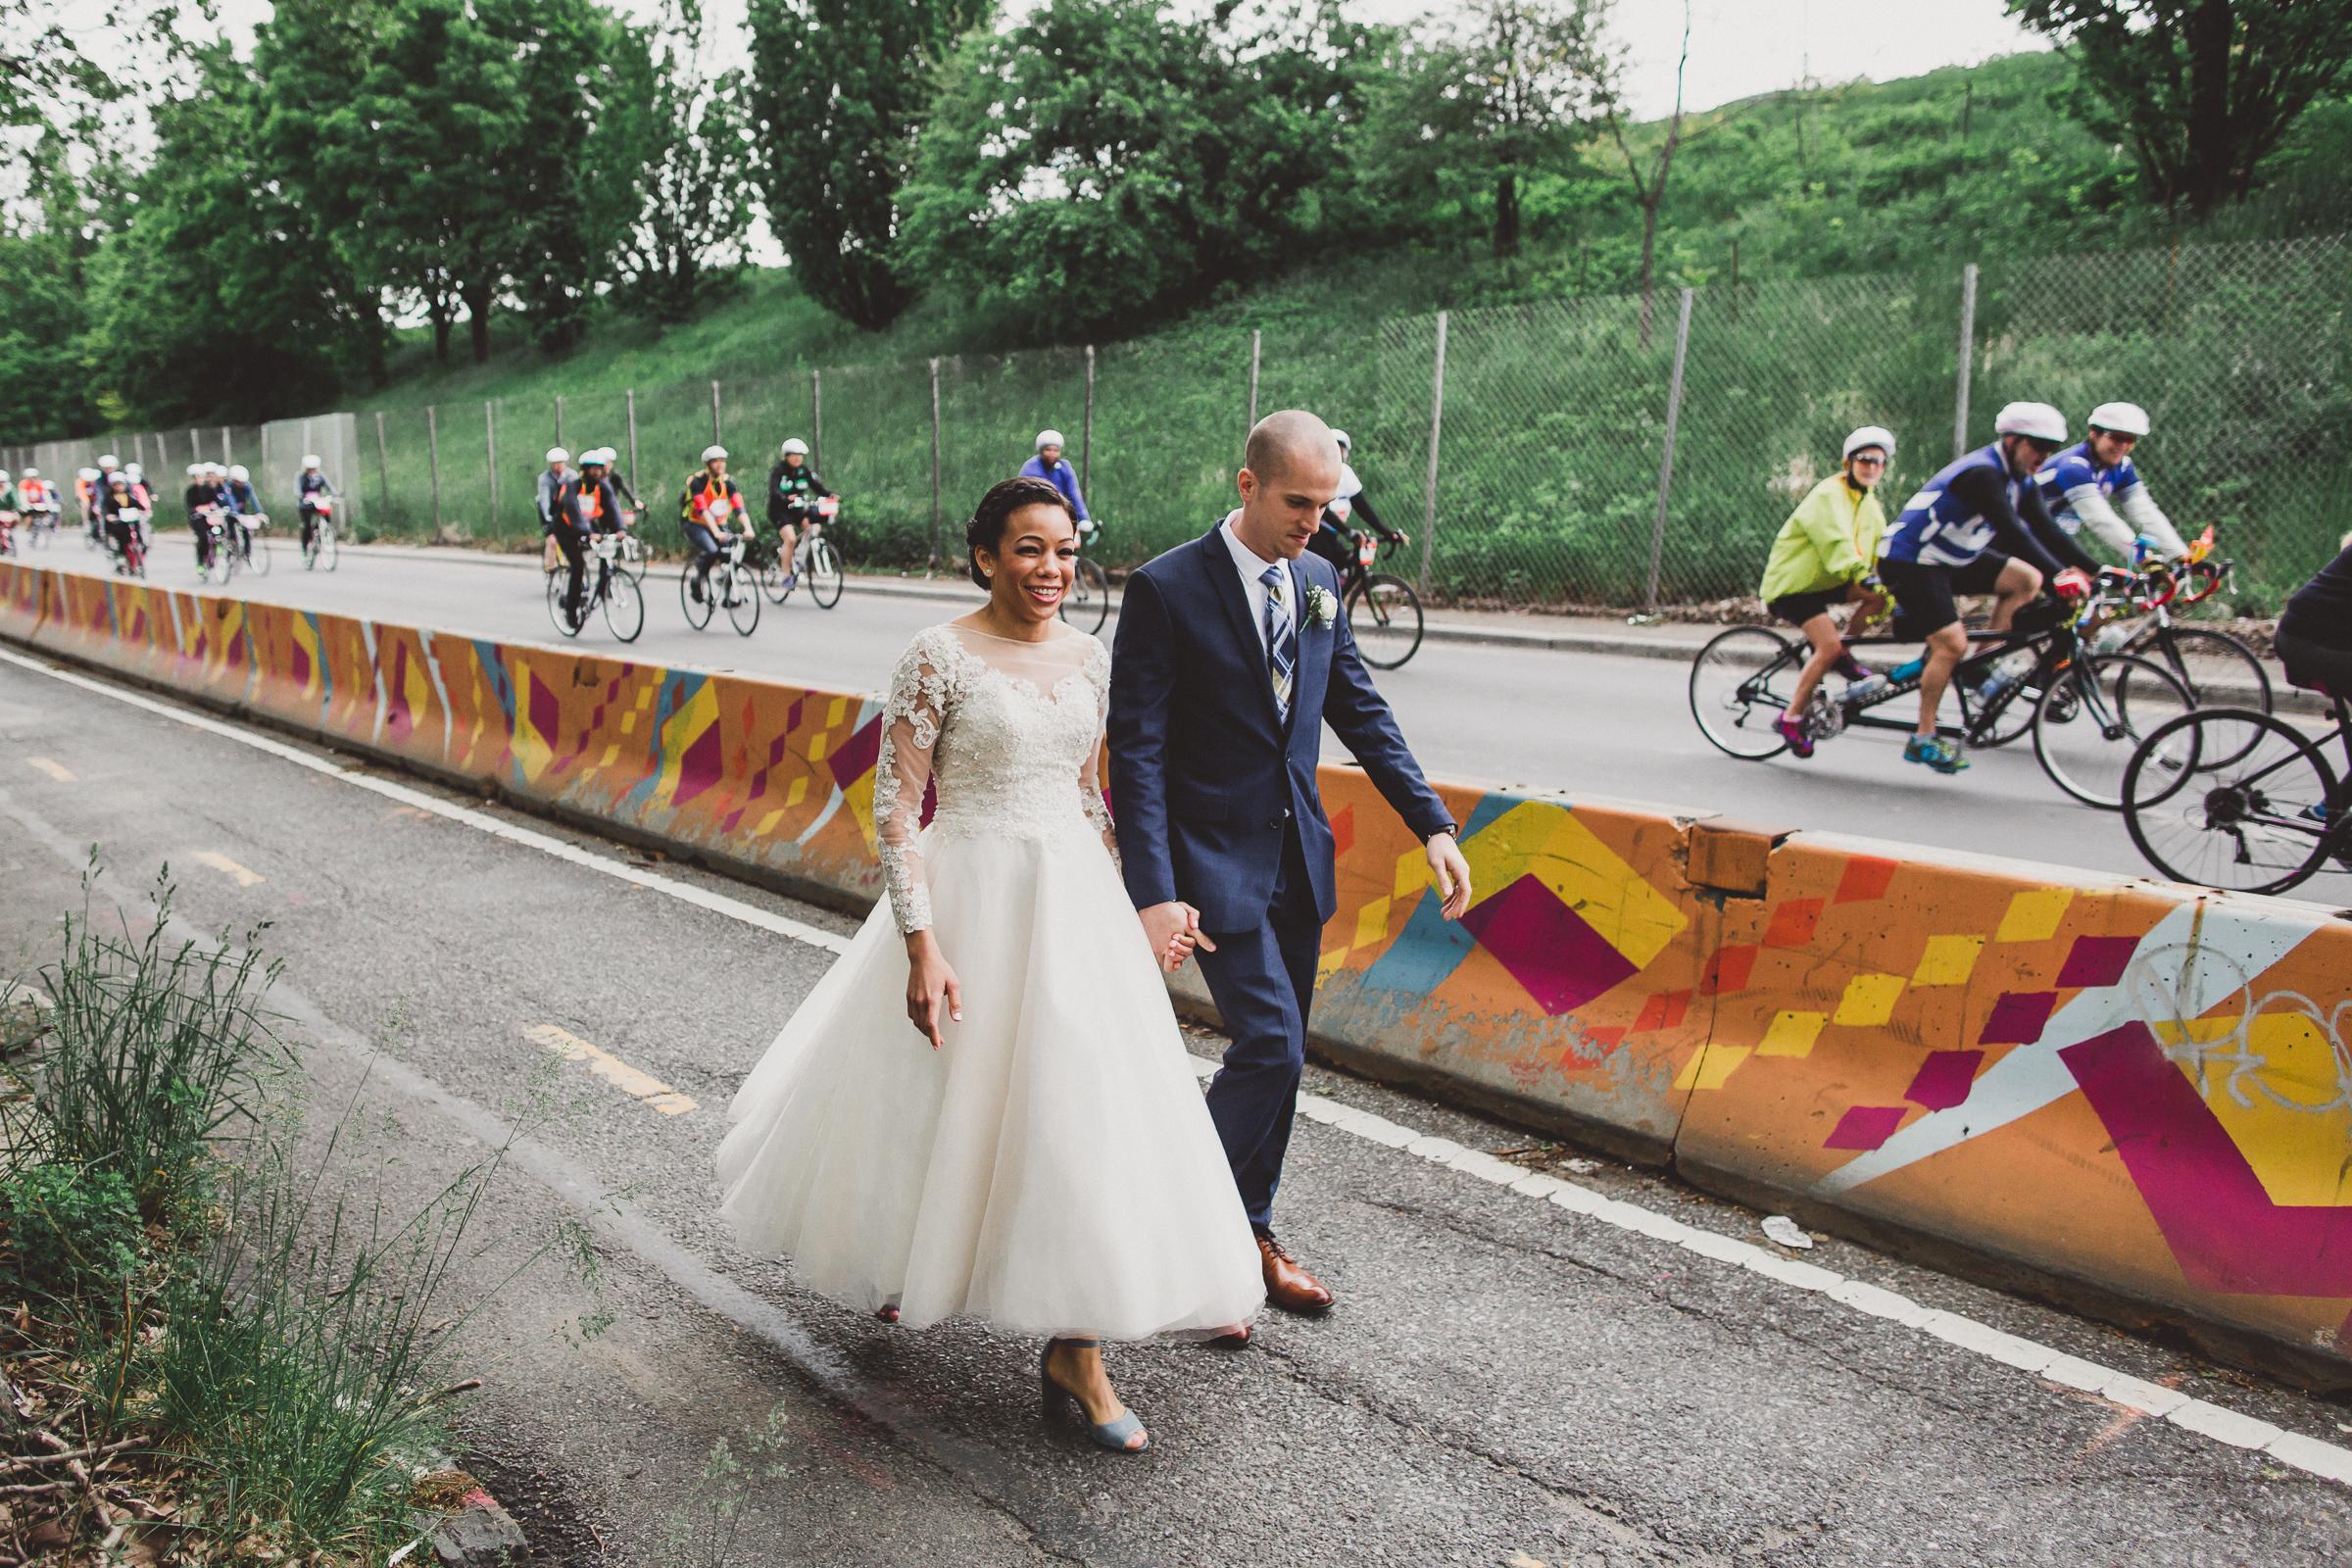 New-York-Documentary-Wedding-Photography-Best-Of-2017-by-Elvira-Kalviste-Photography-56.jpg